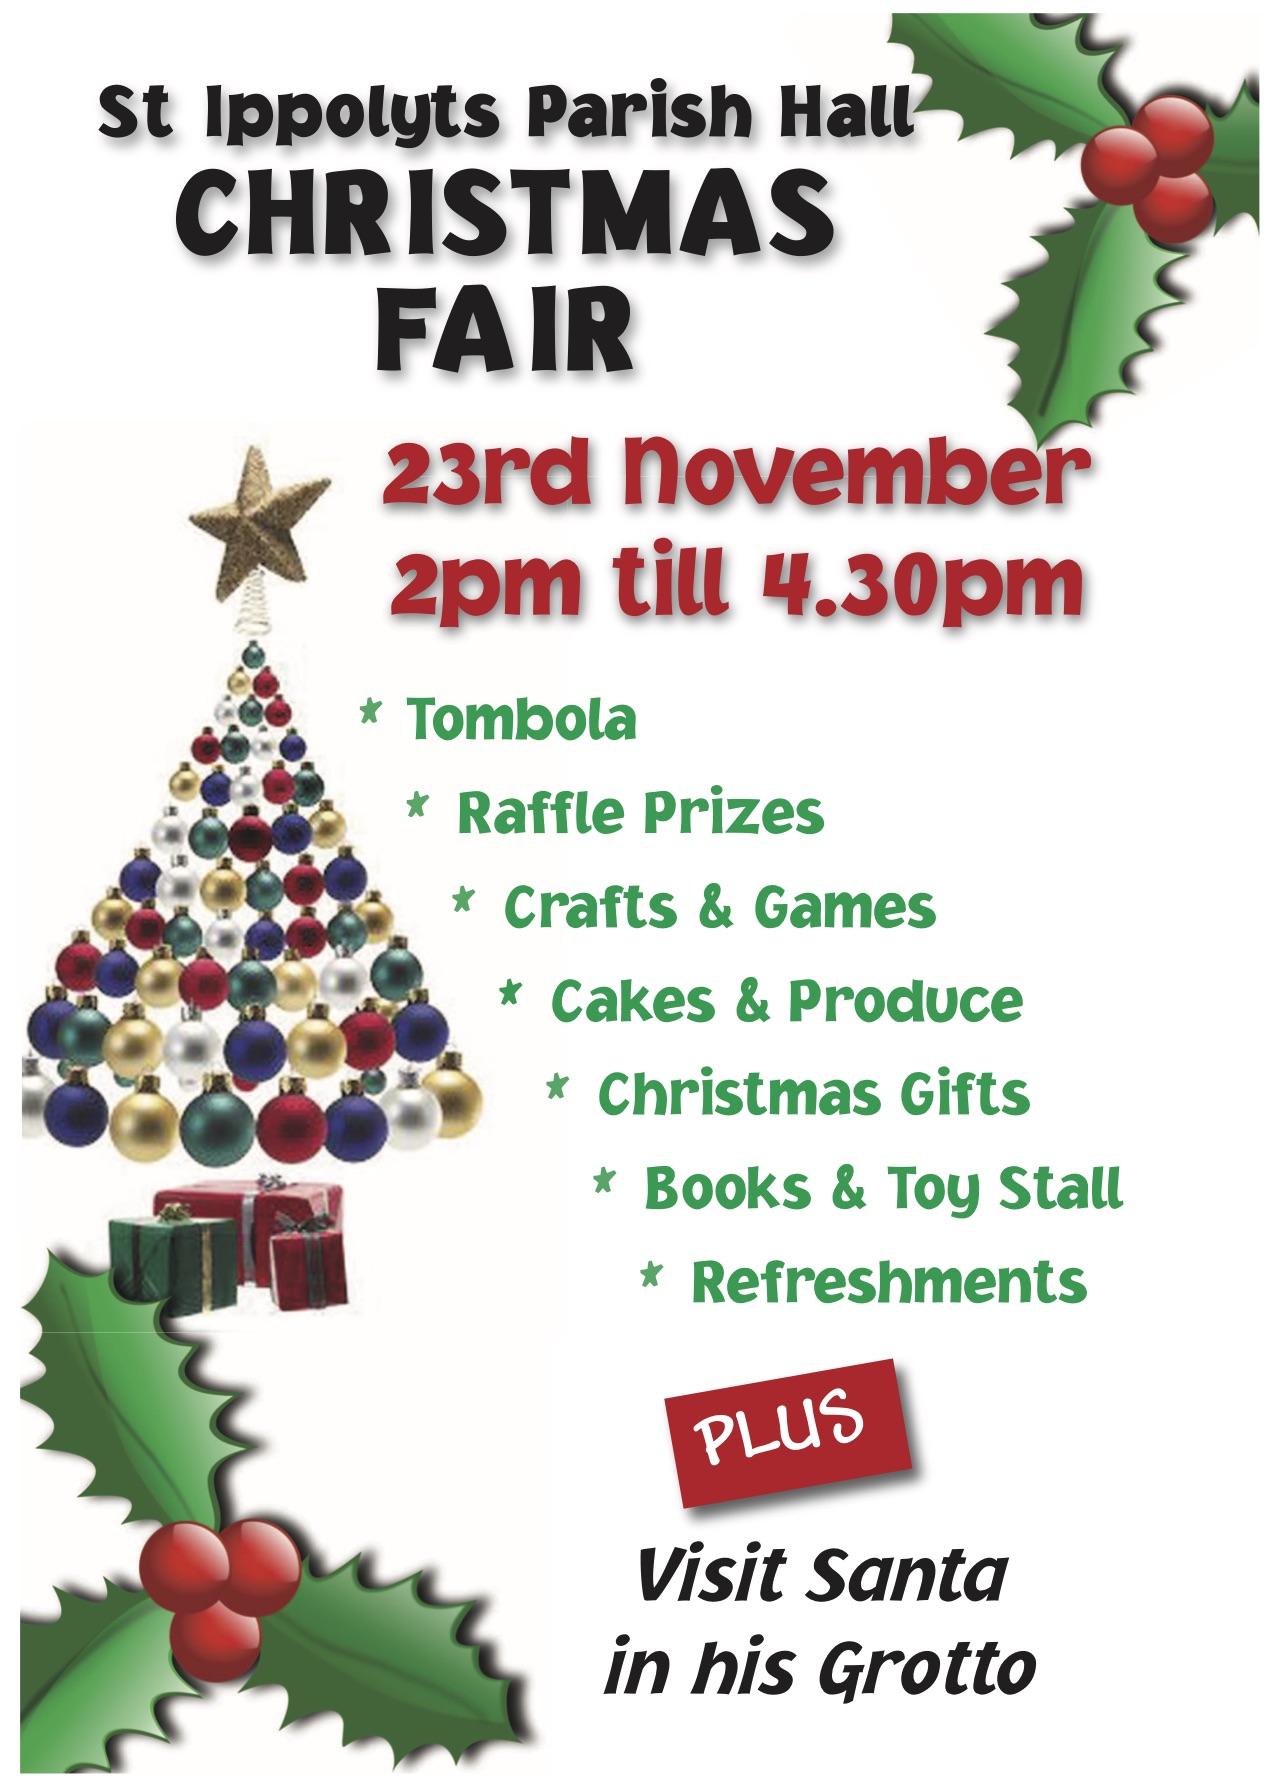 Parish Hall Christmas Fair, 23rd November 2019